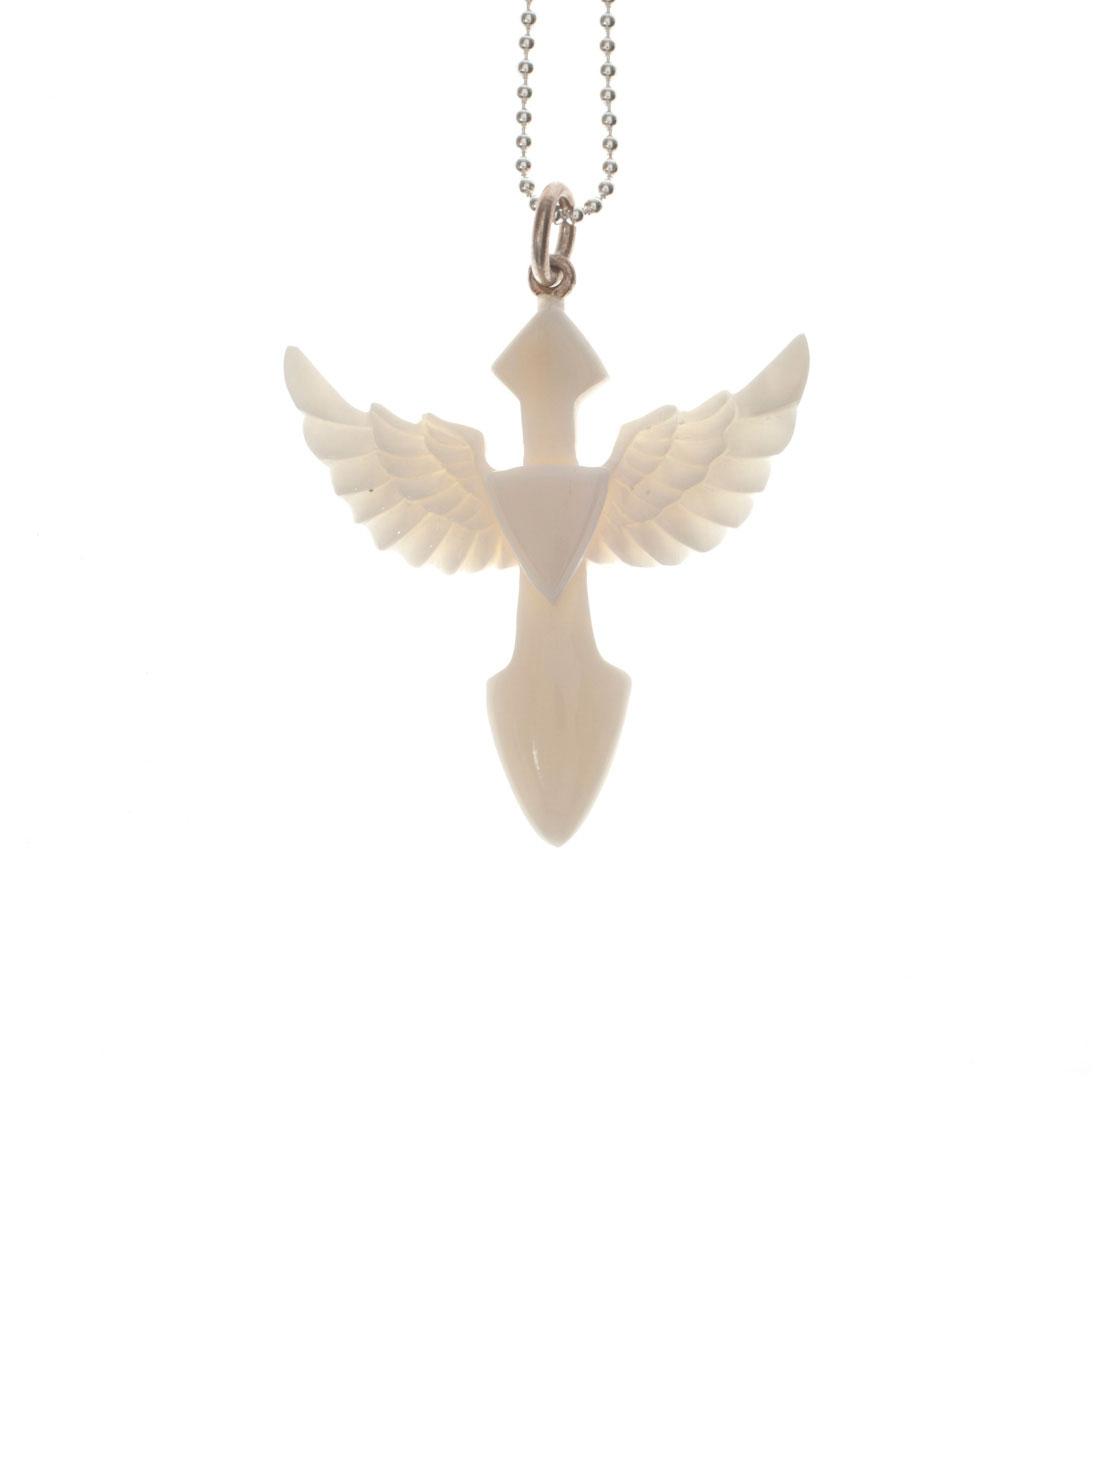 Bone Feathered Necklace